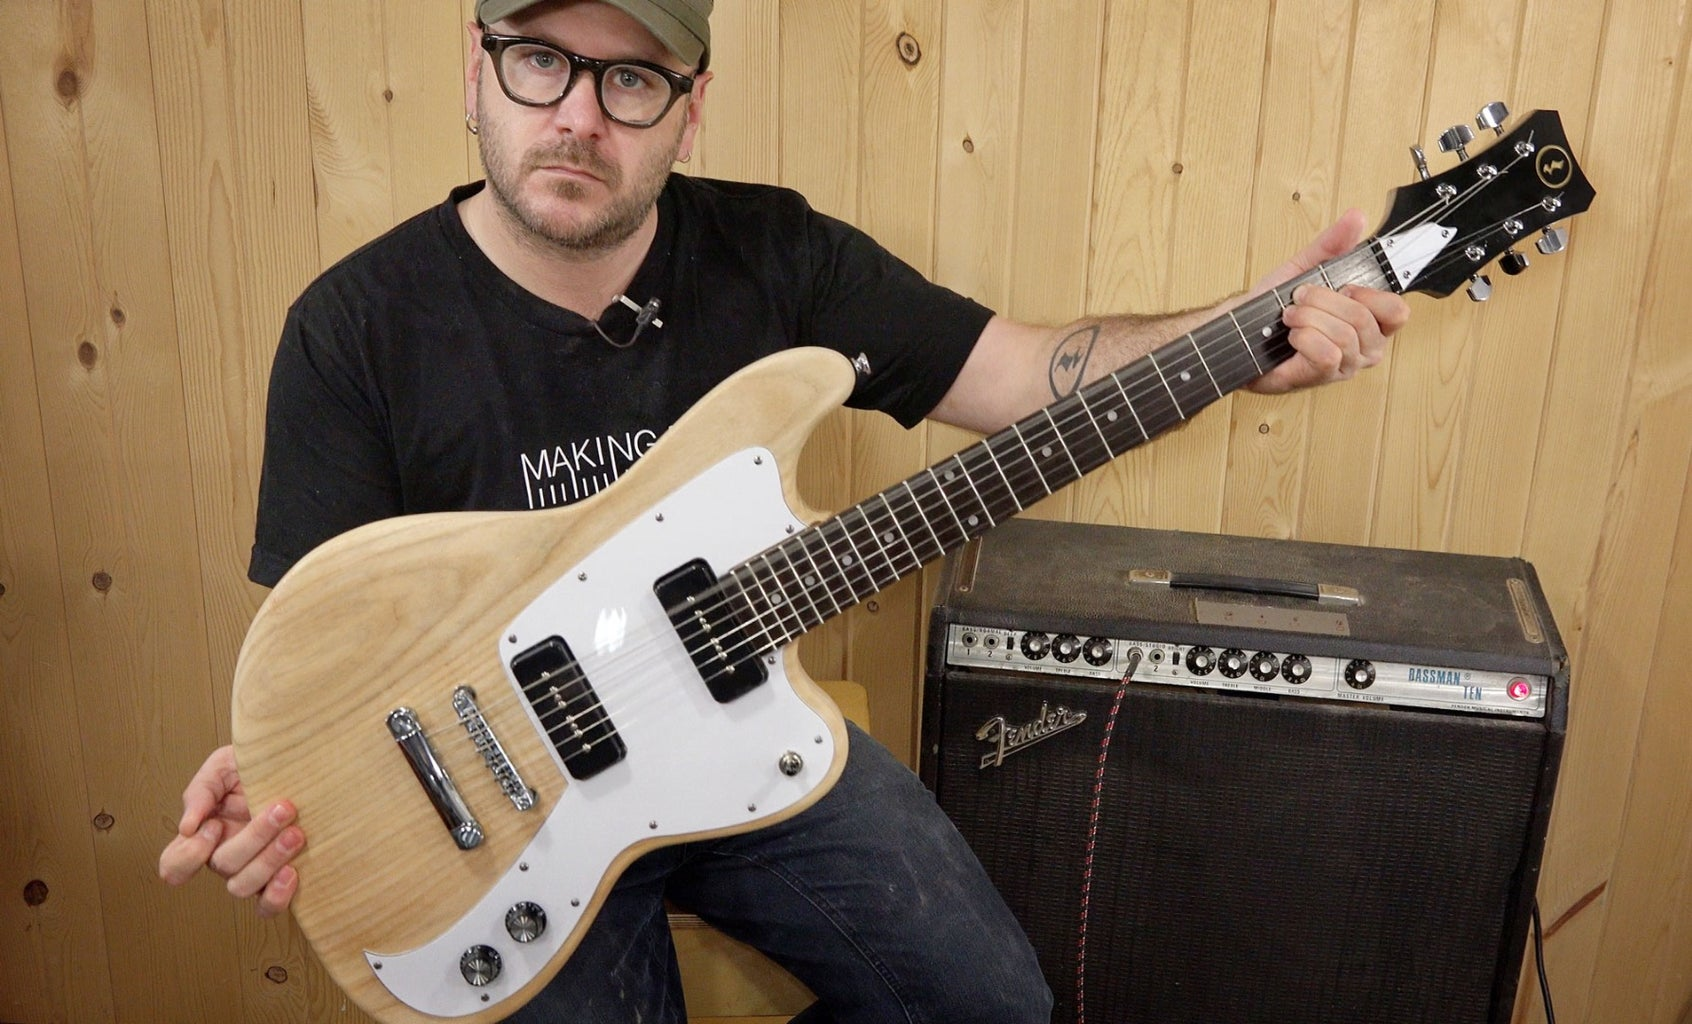 Make a Guitar With CNC